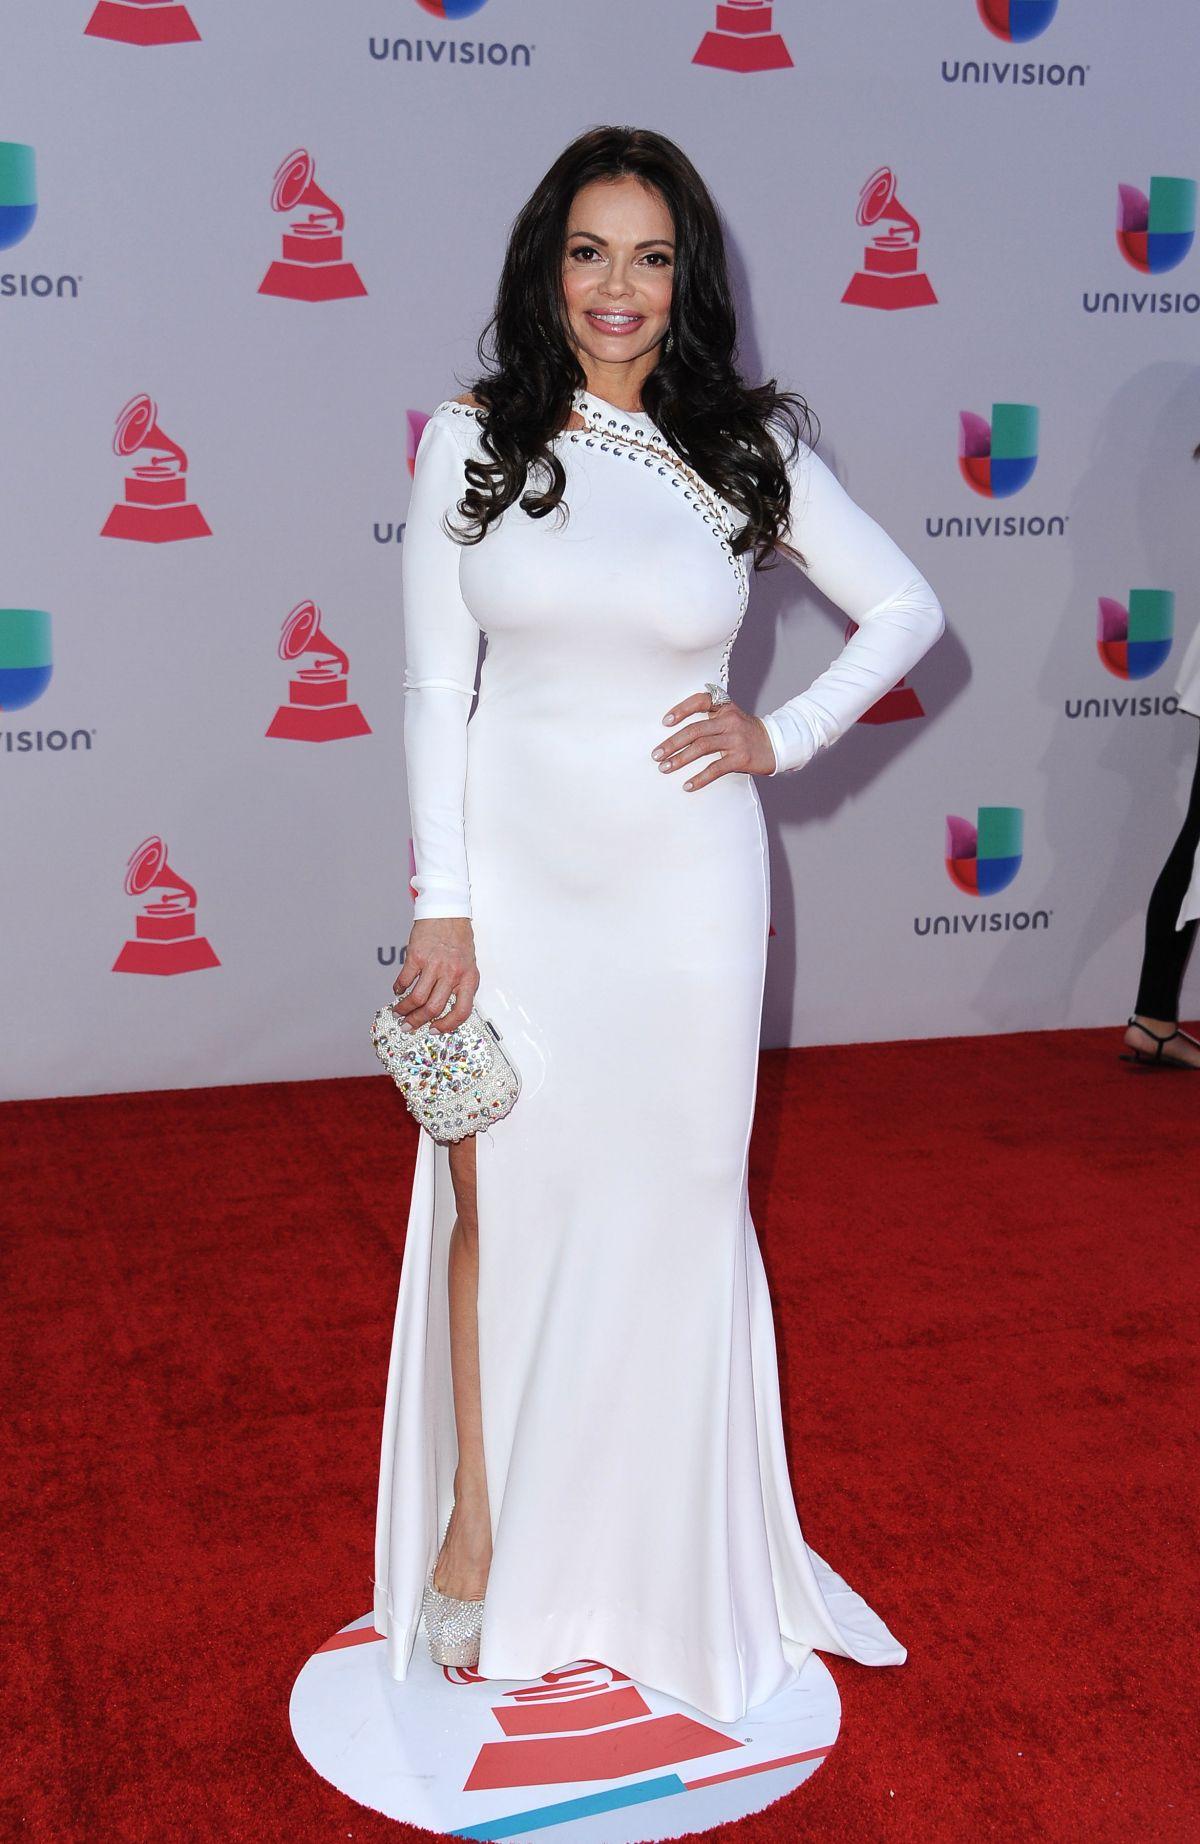 JULIE FERRETTI at 2015 Latin Grammy Awards in Las Vegas 11/18/2015